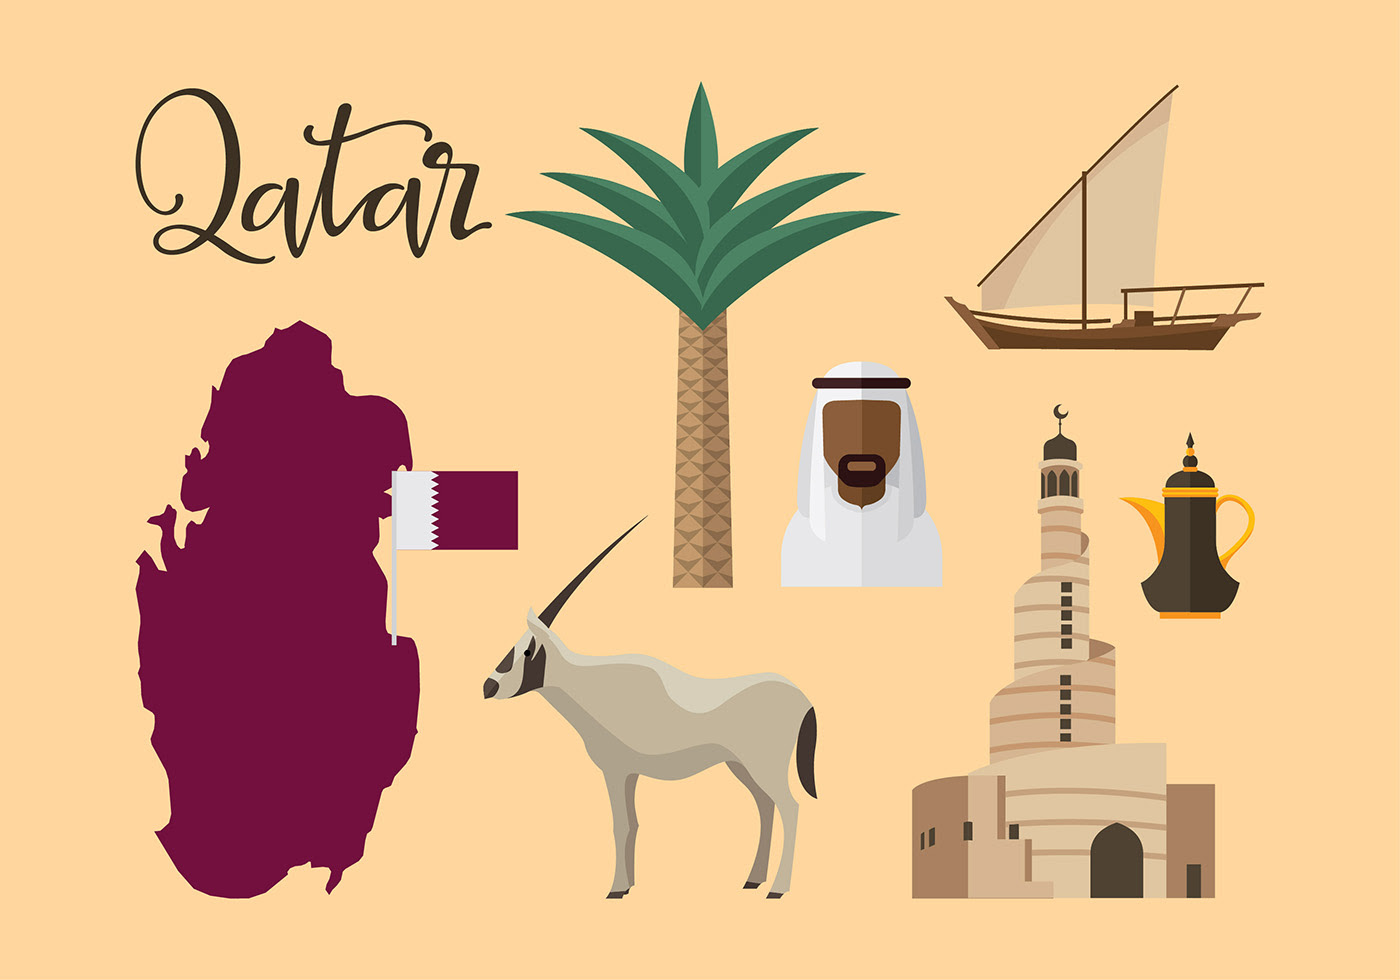 Qatar Travel Icon Vector Download Free Vector Art Stock